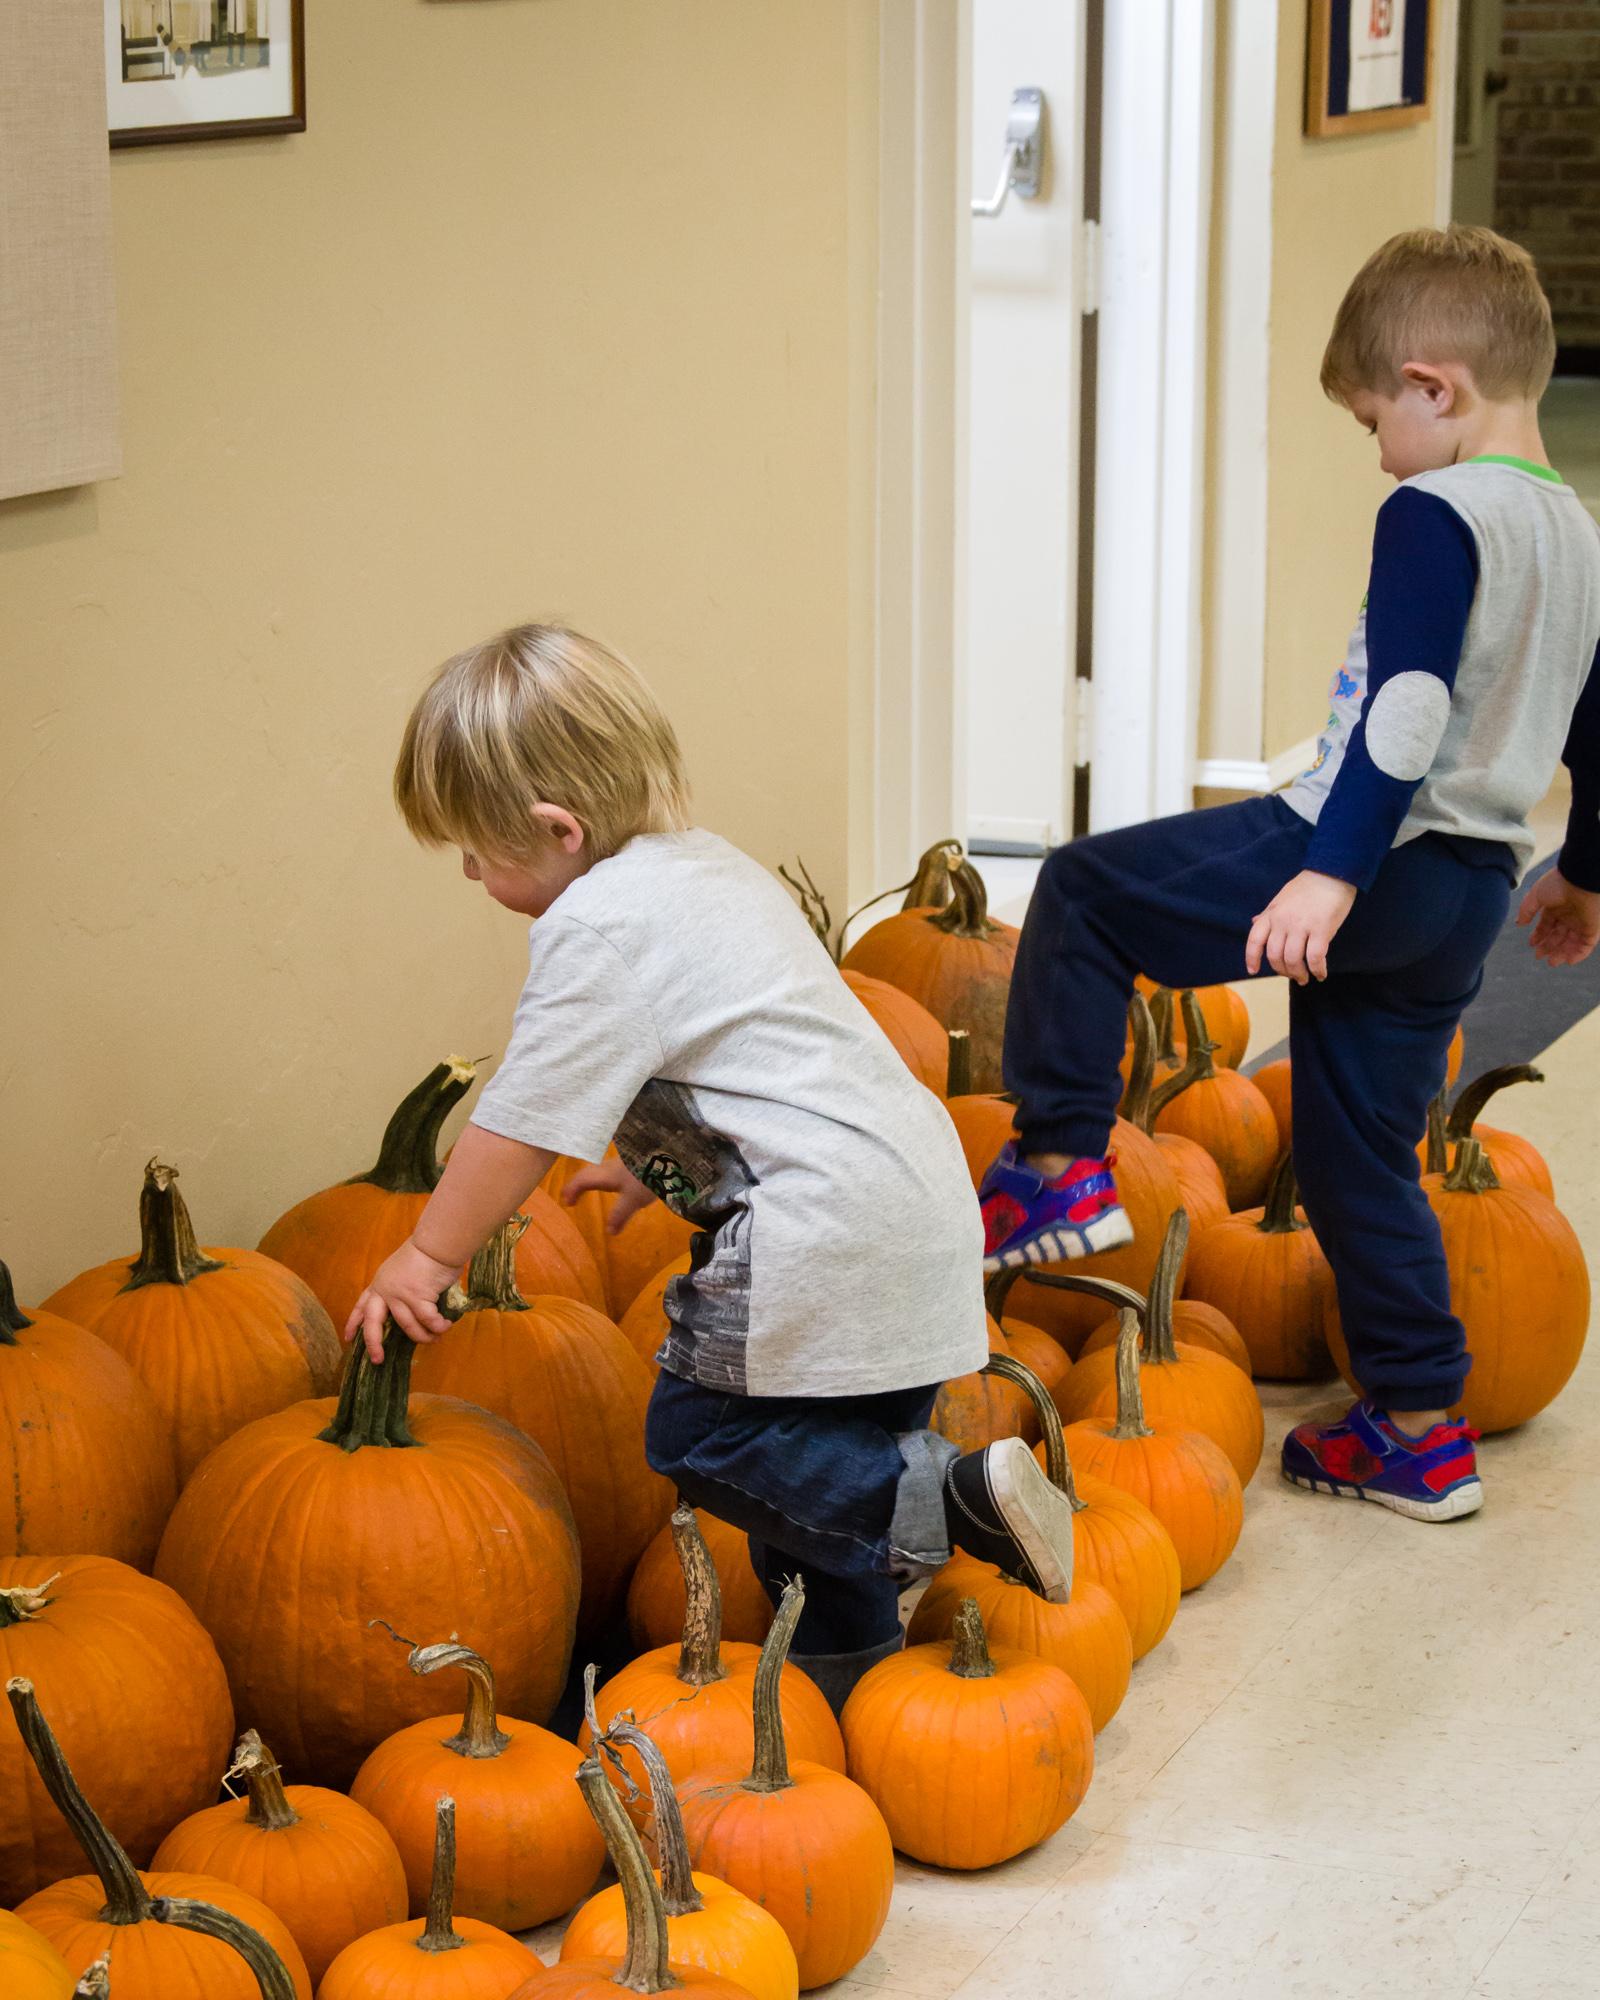 Knee-deep in pumpkins